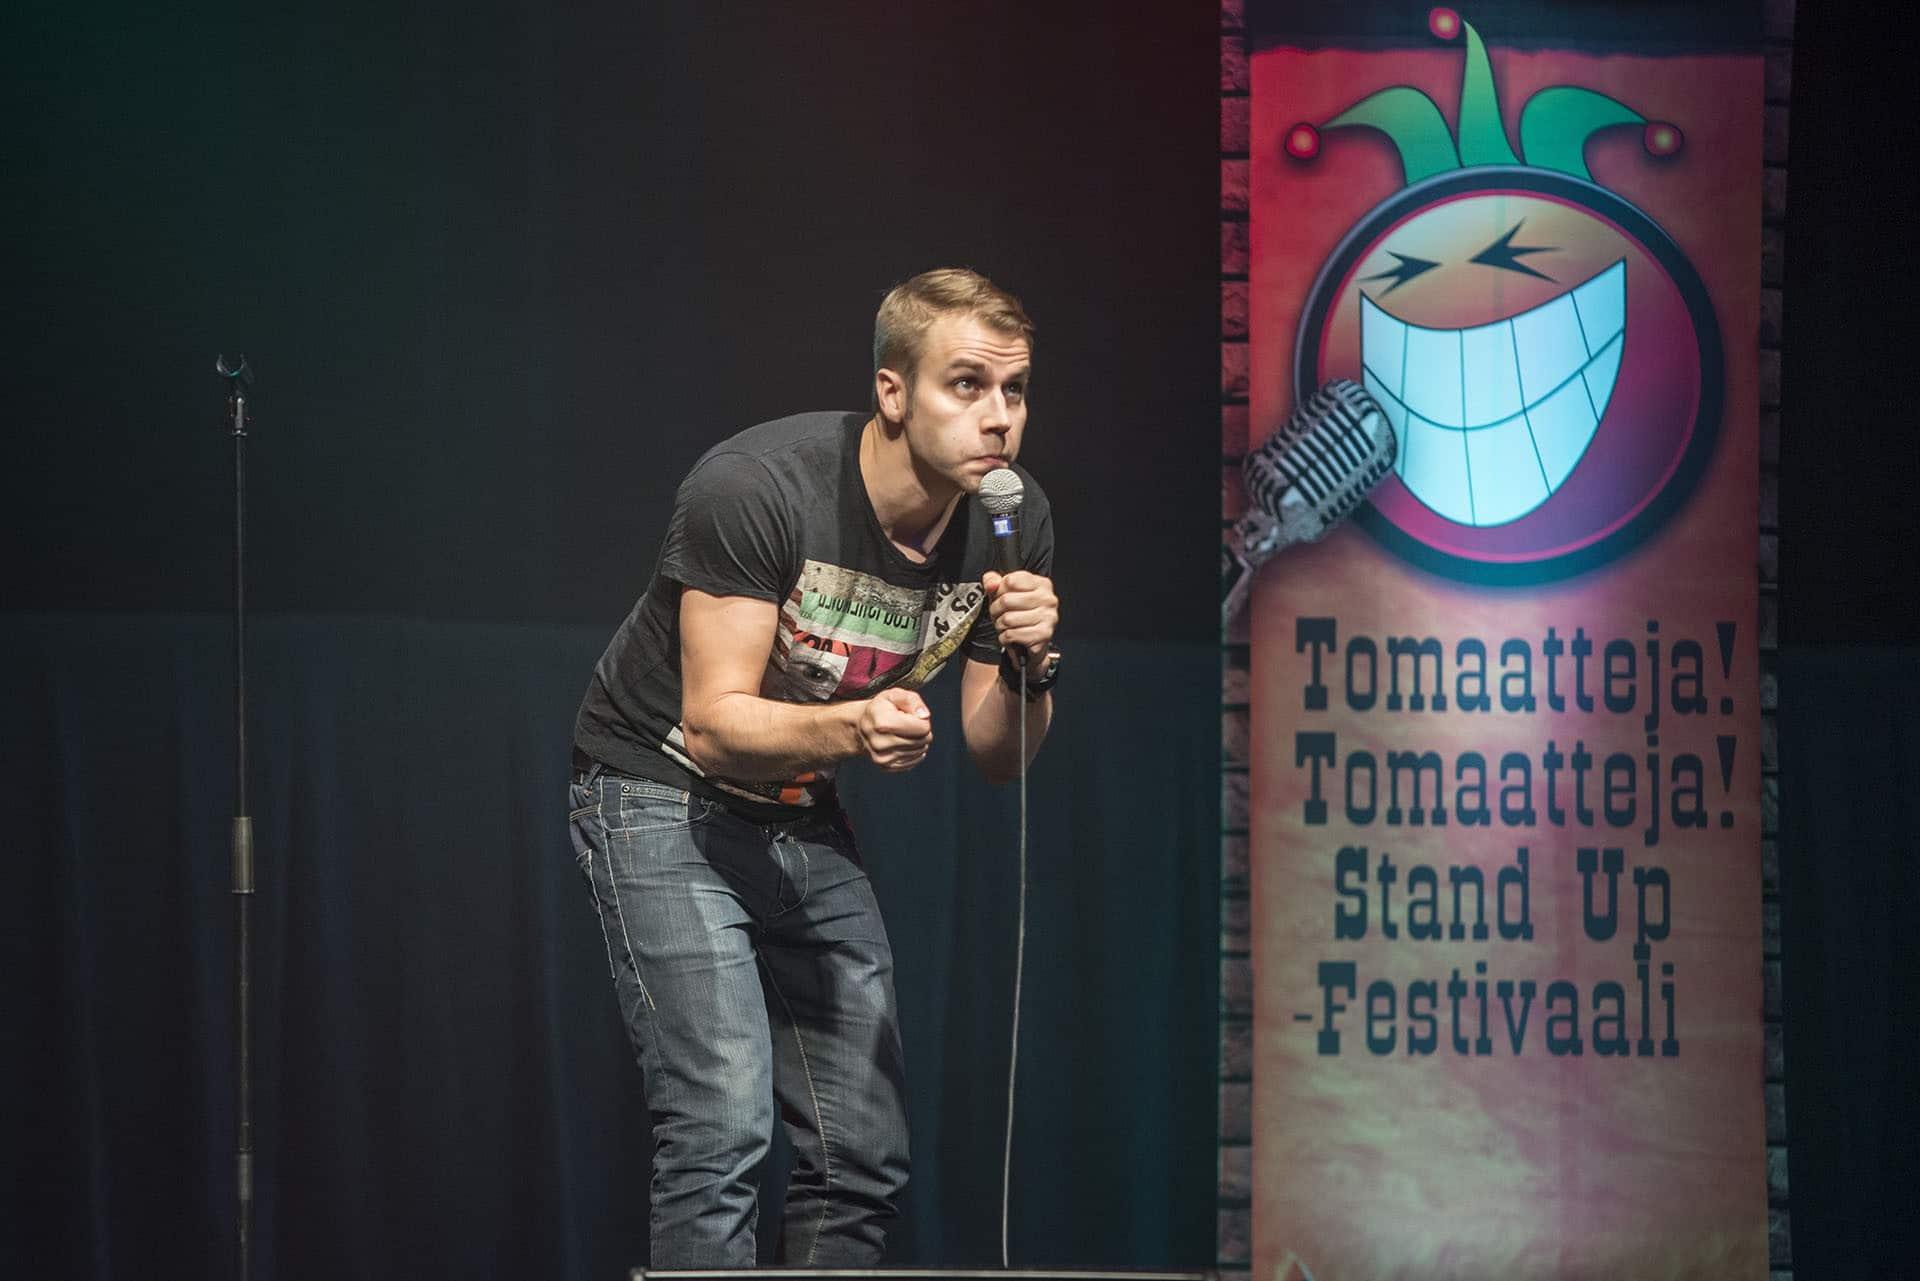 Tomaatteja! Tomaatteja! 2013_Kari Savolainen